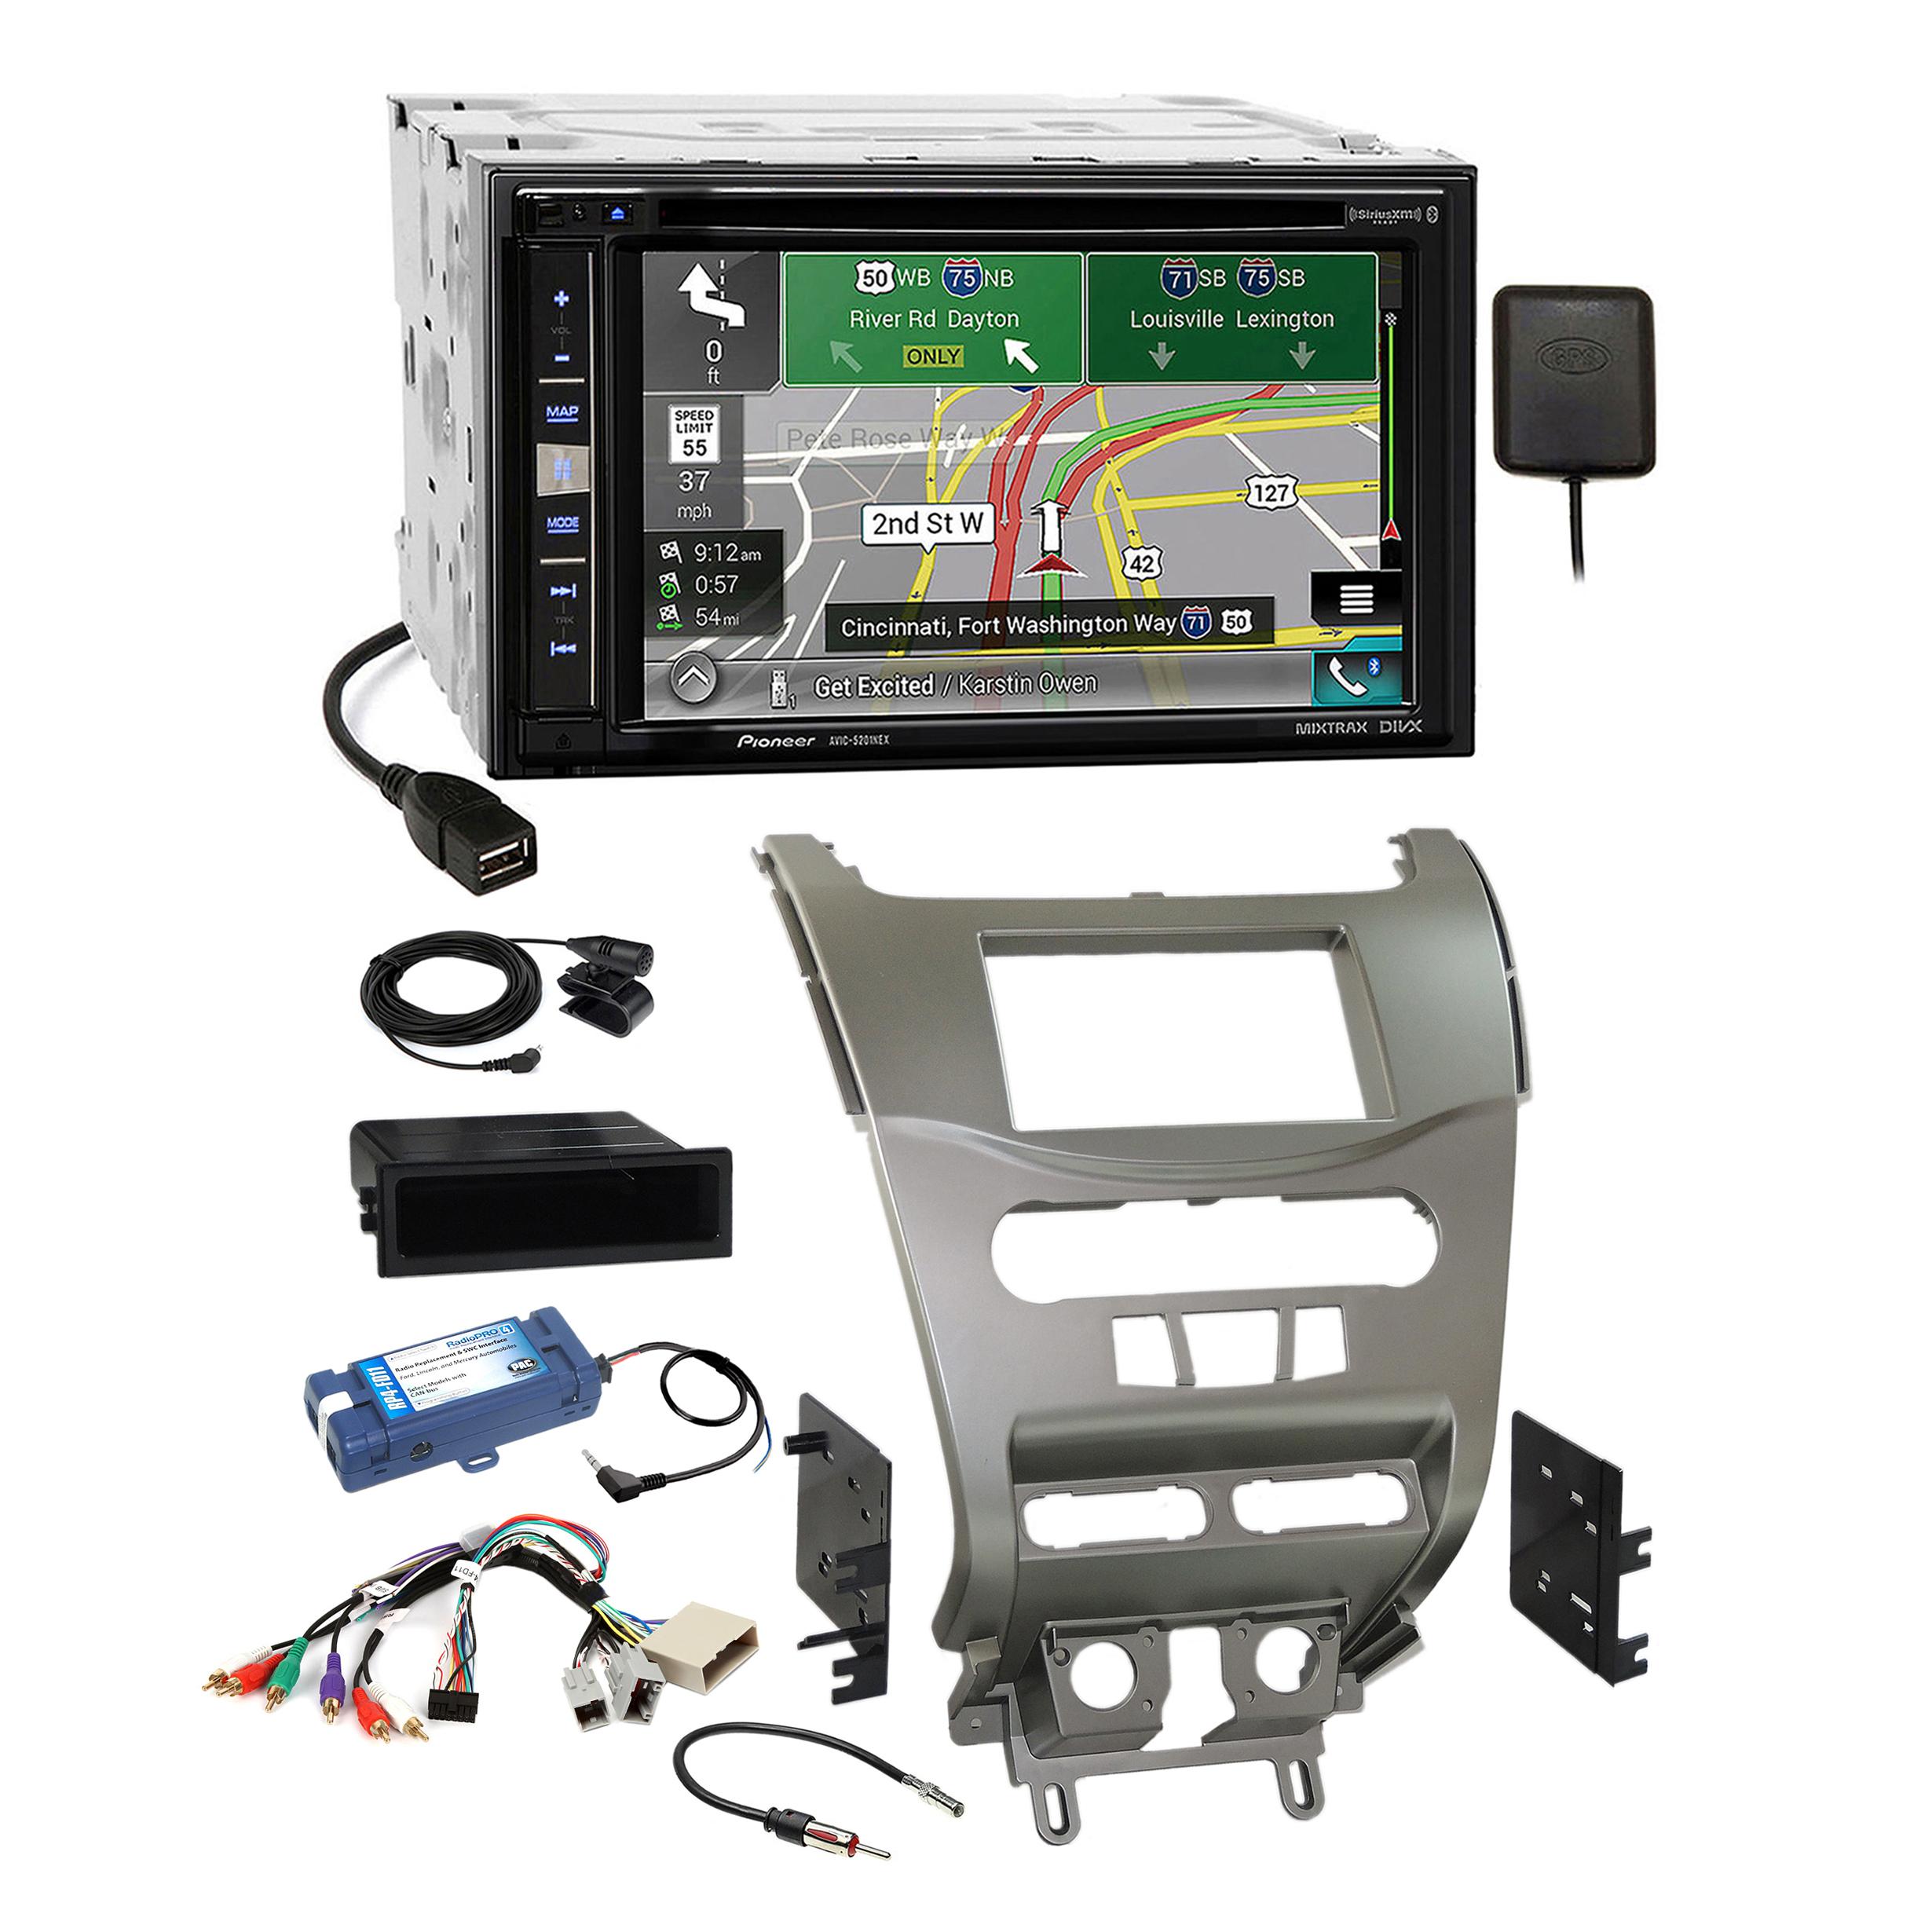 Astounding Pioneer Gps Carplay Sirius Stereo Silv Dash Kit Amp Harness For 08 Wiring Cloud Pendufoxcilixyz